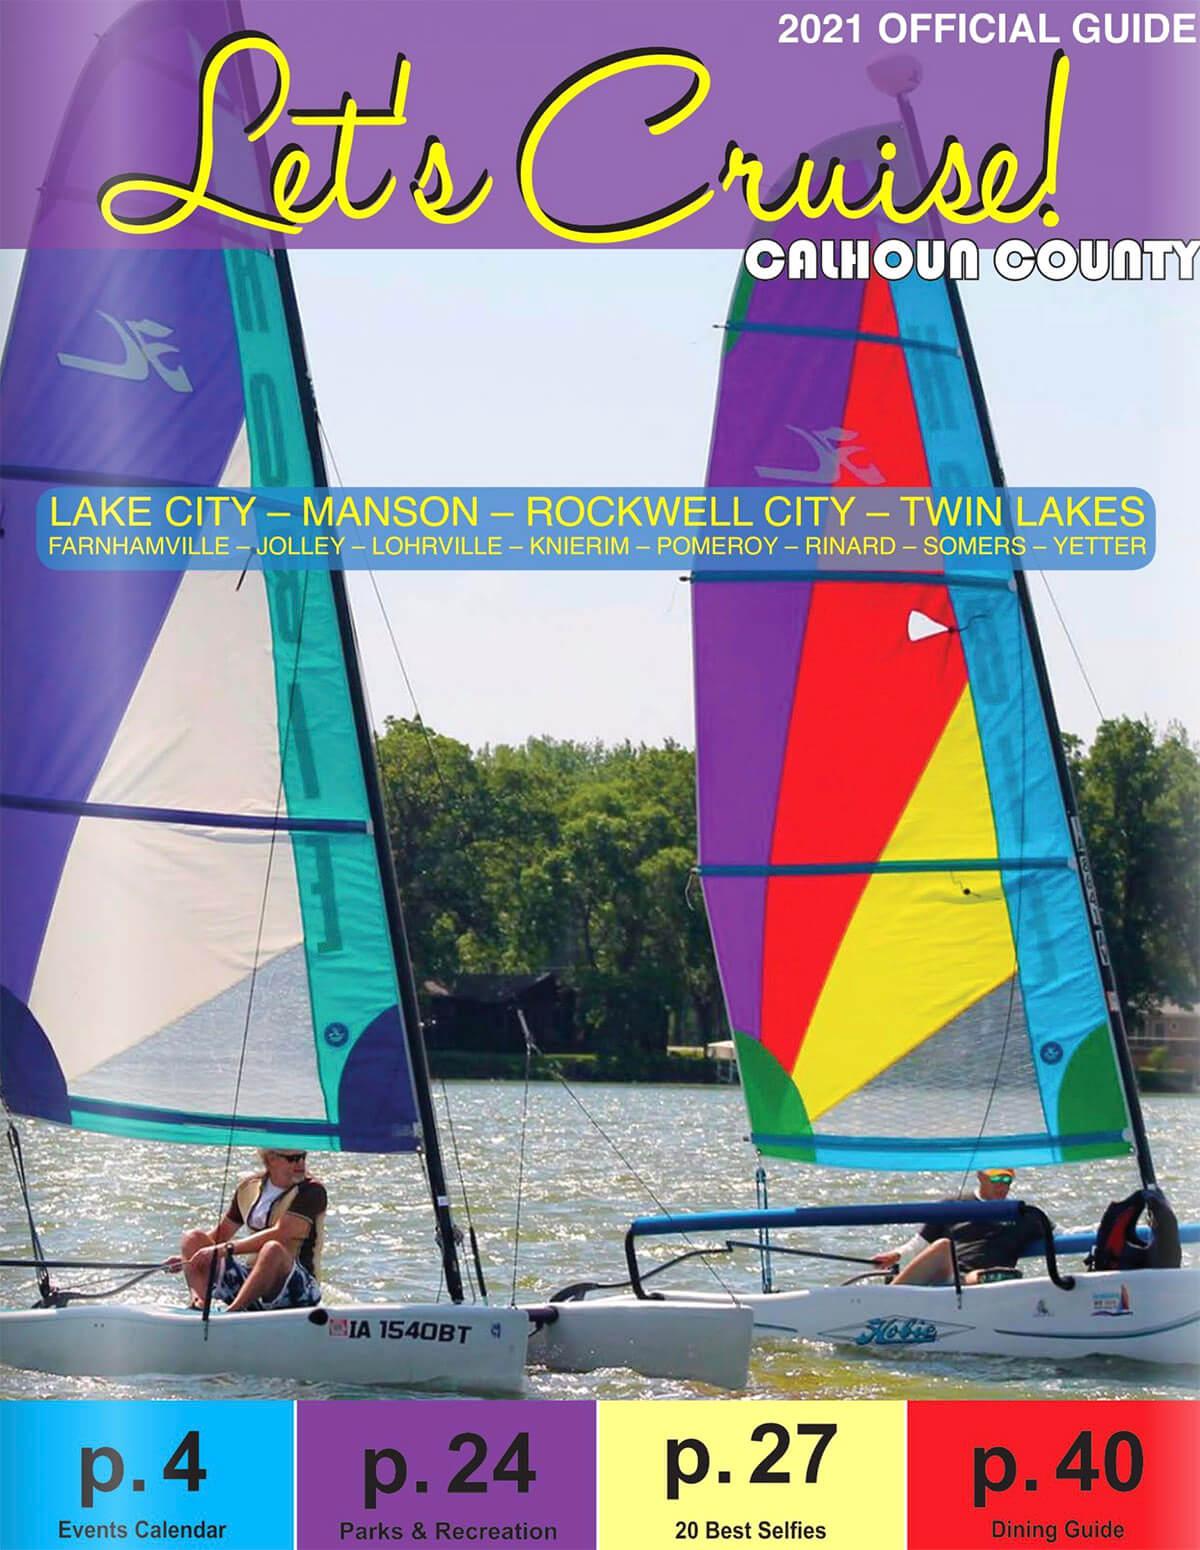 Cruise Calhoun Guide